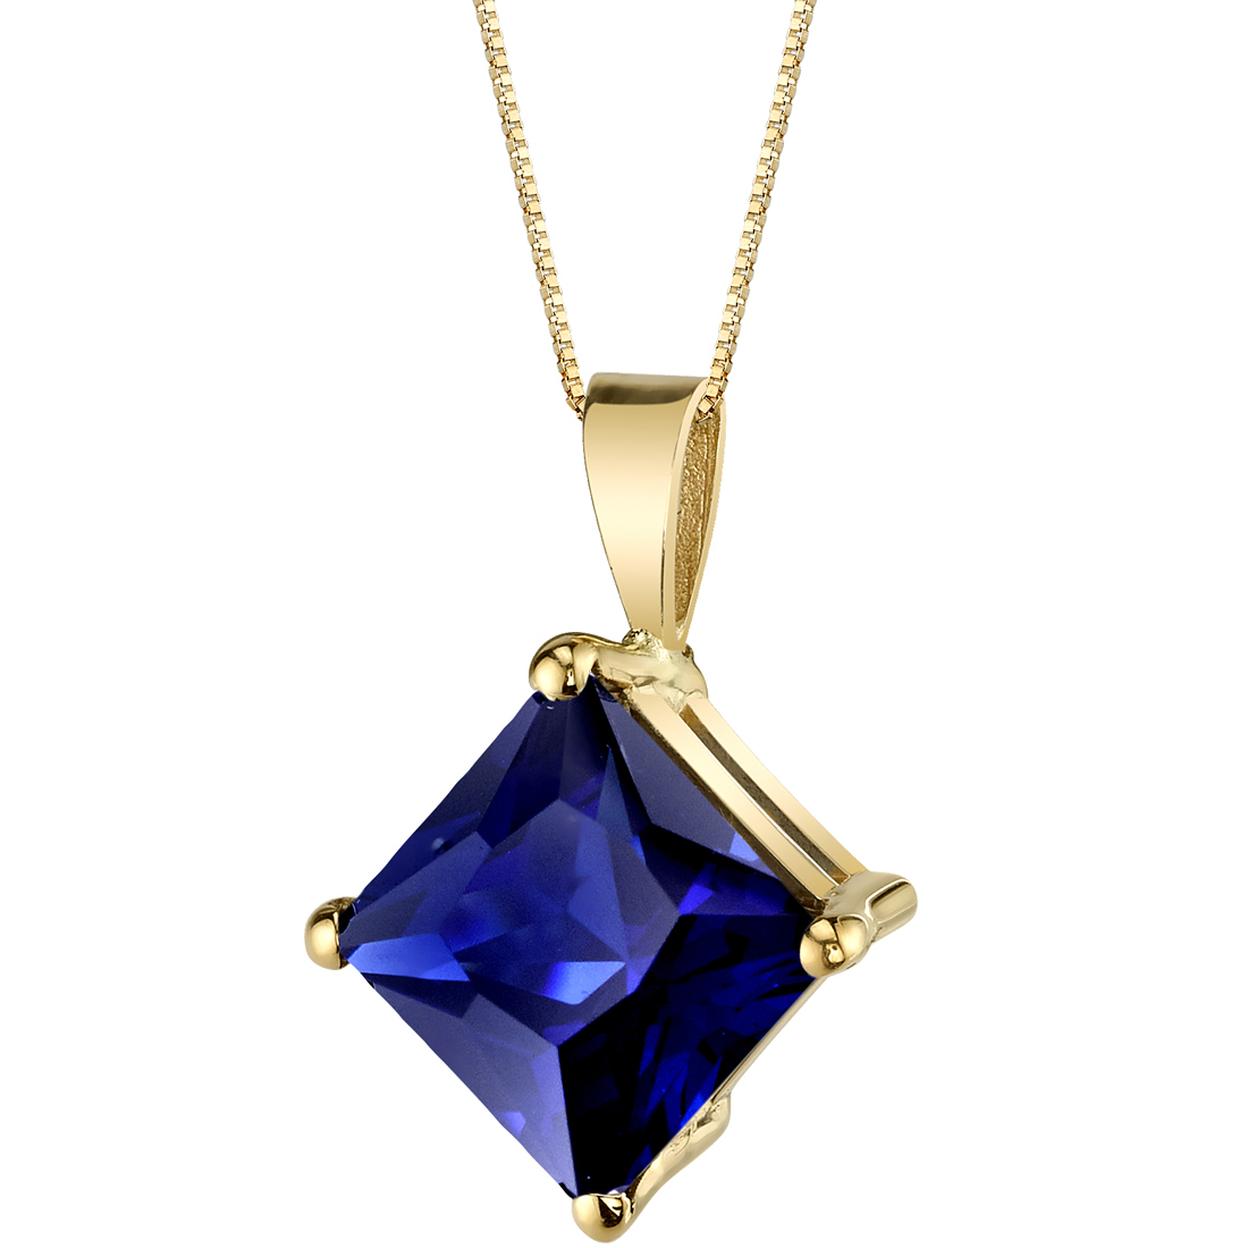 Oravo 14 Karat Yellow Gold Princess Cut 3.50 Carats Created Blue Sapphire Pendant